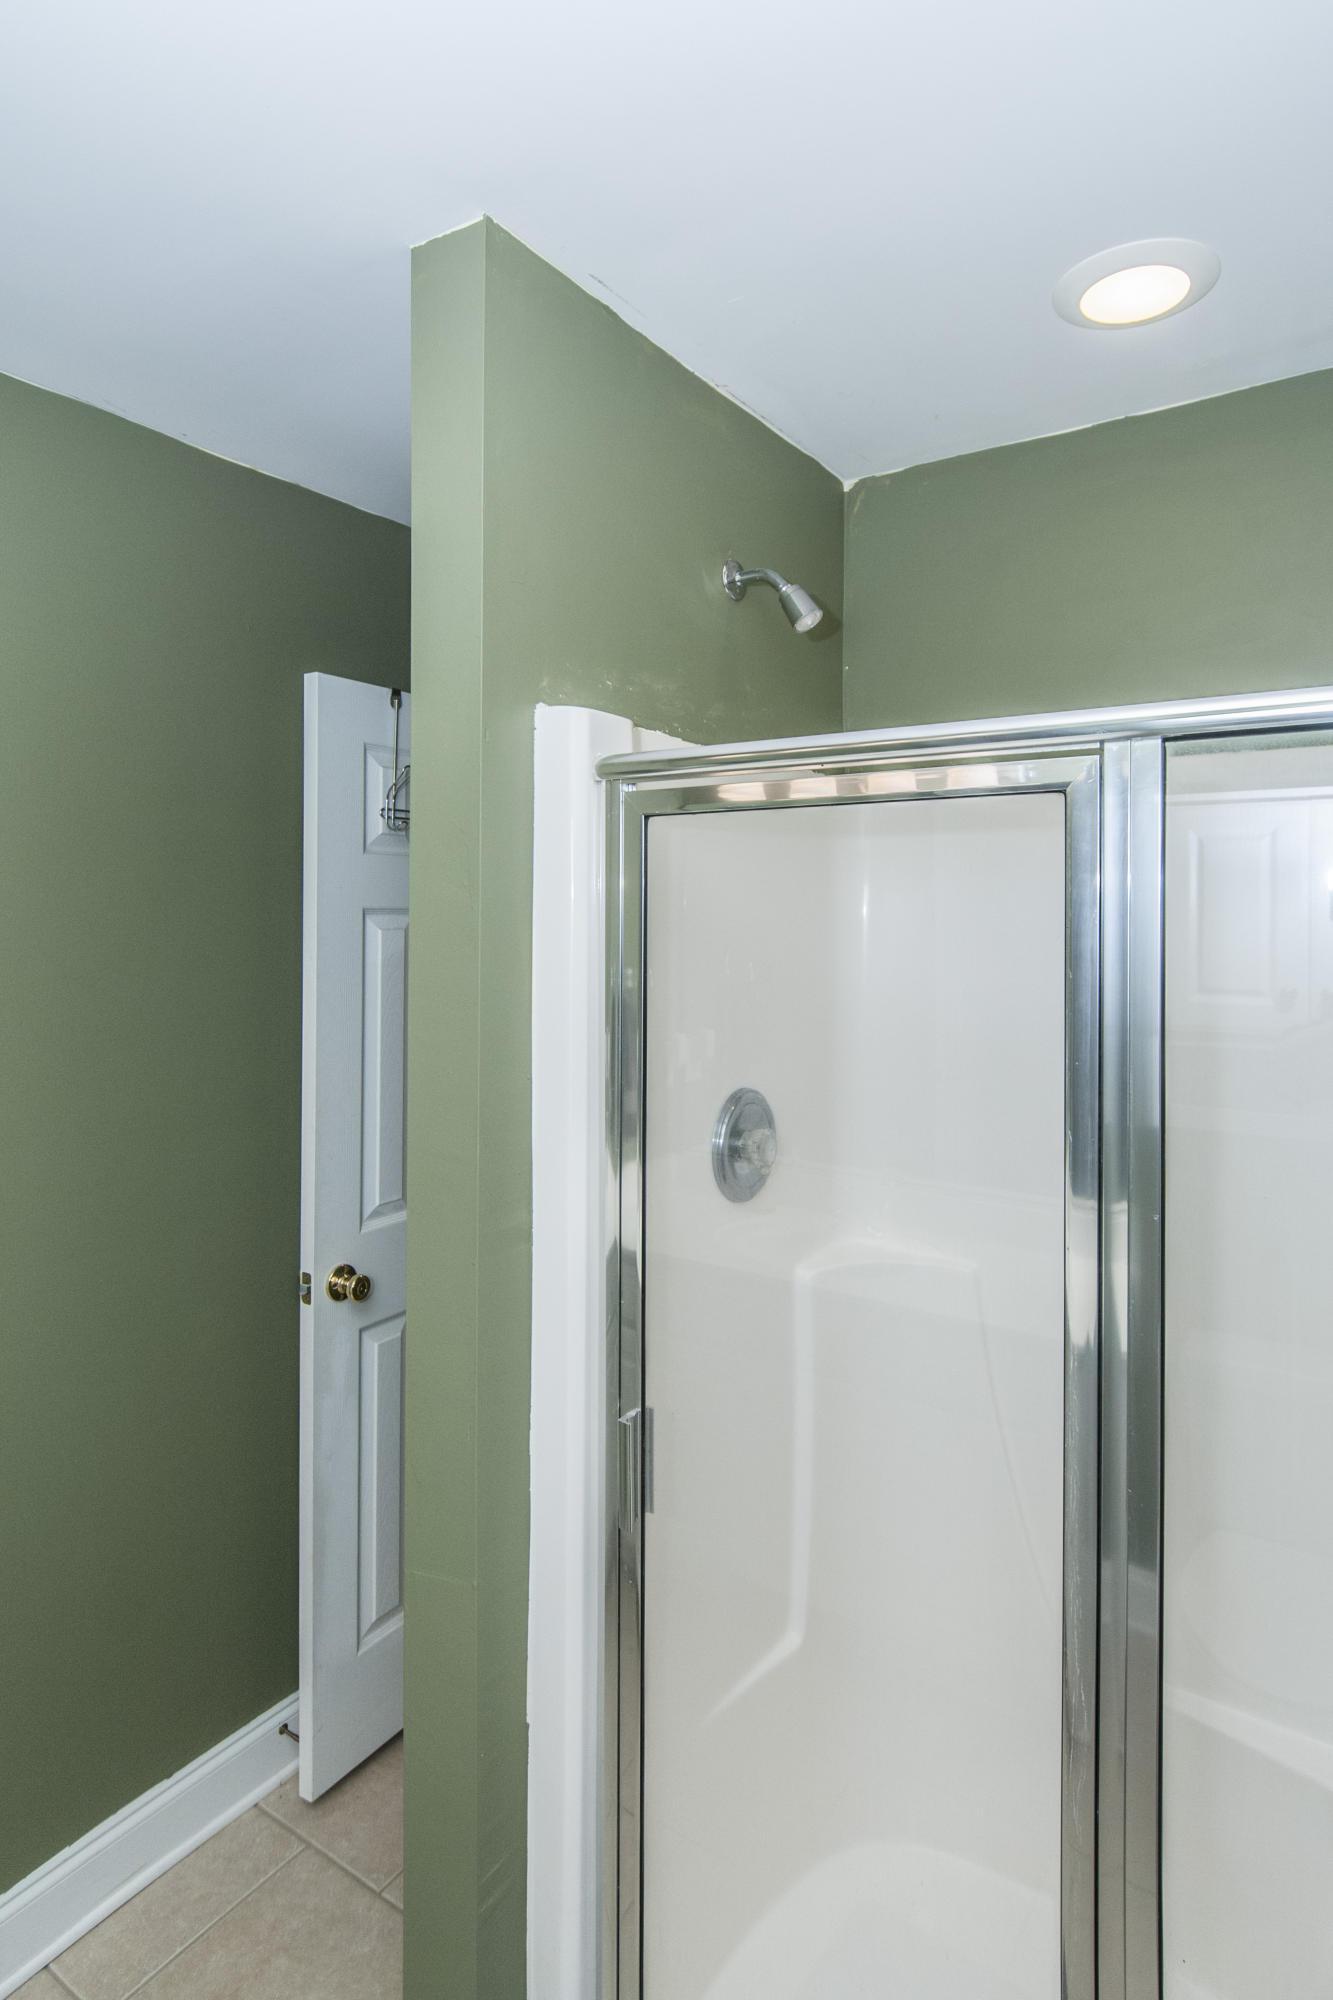 Longbranch Point Homes For Sale - 940 Estates, Charleston, SC - 7